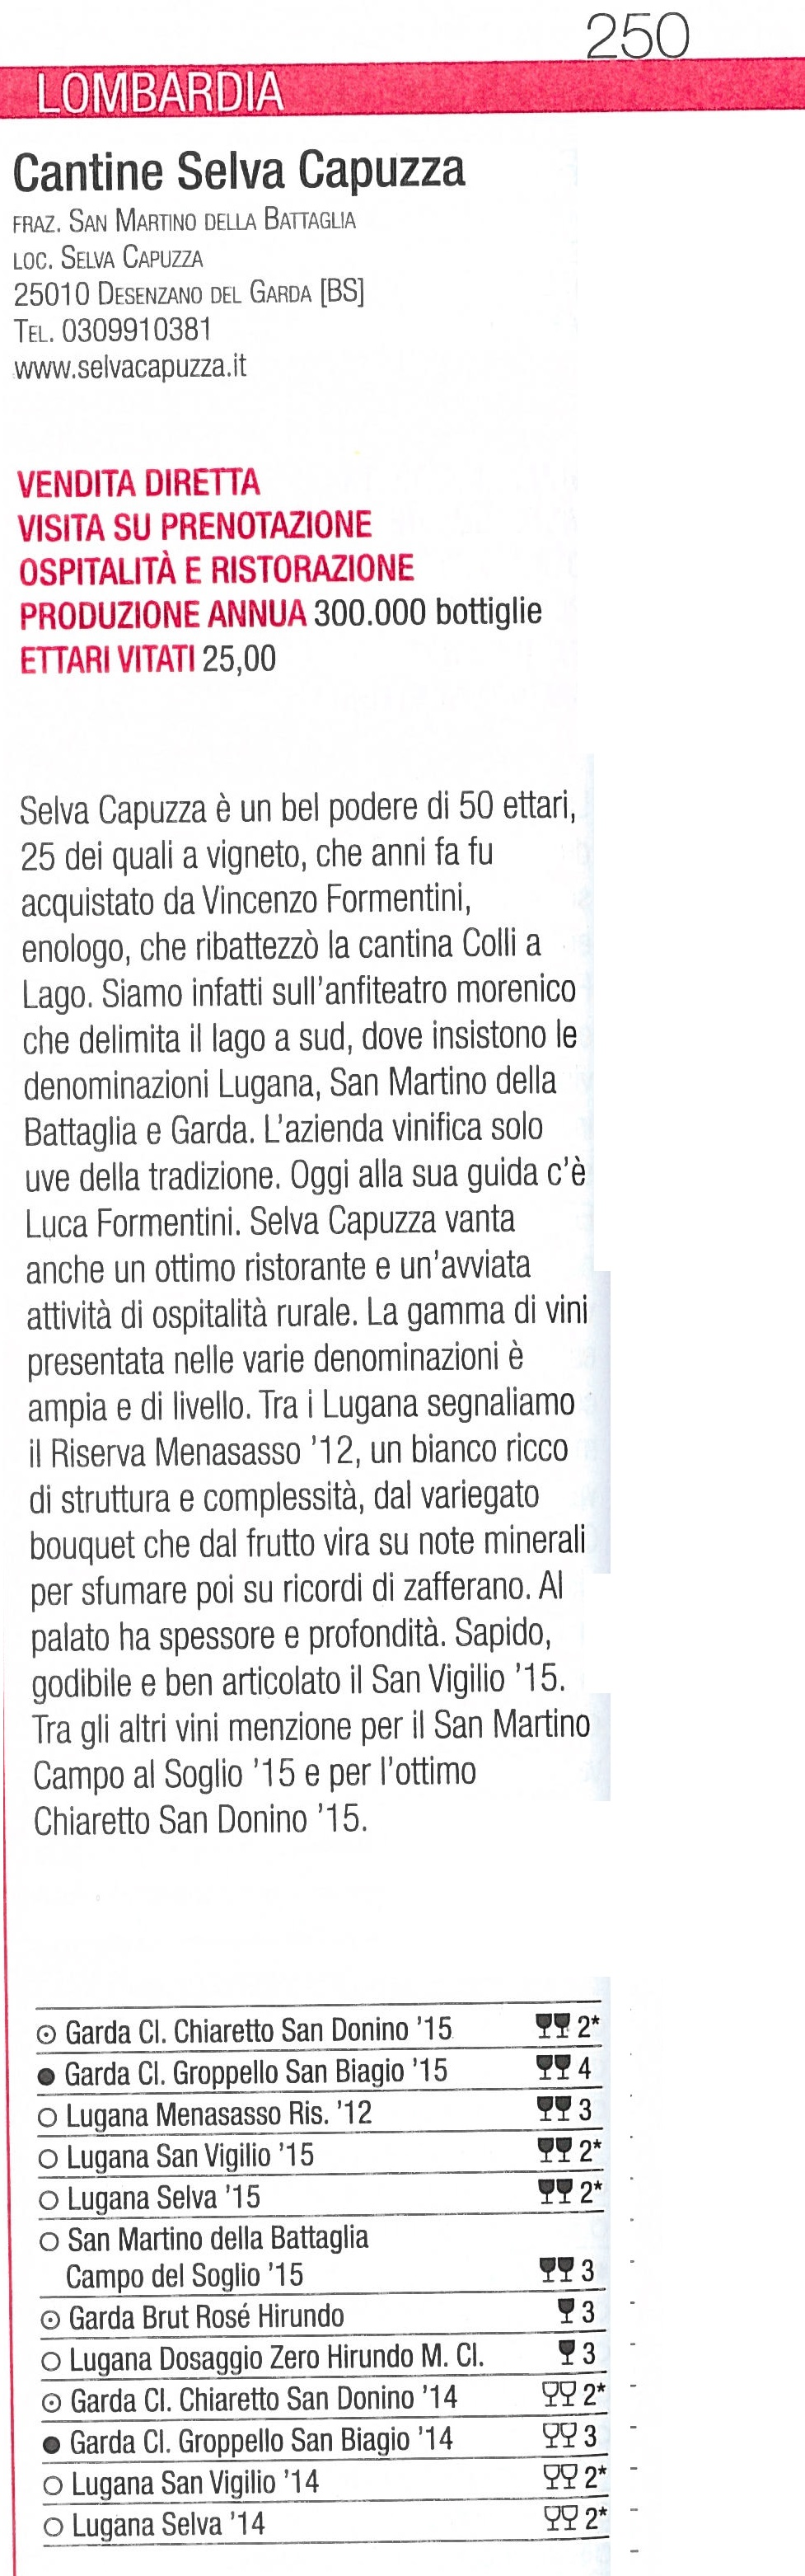 Gambero Rosso_Vini d'Italia_2017_pag 250.jpg